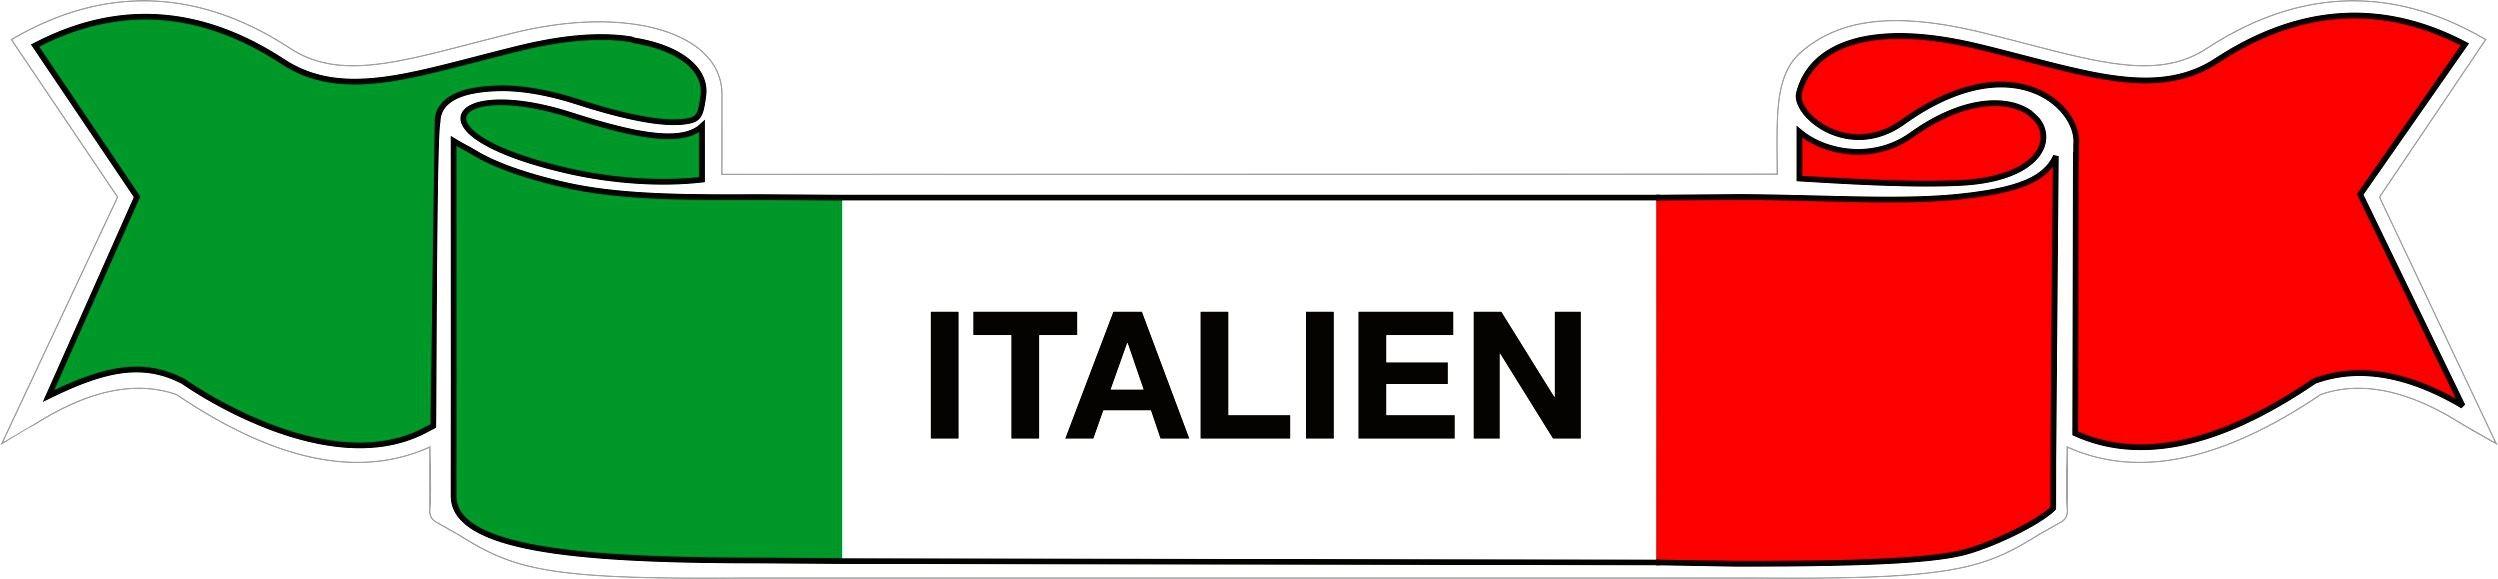 Aufkleber Flagge Italien 100 x 430 mm Fanartikel  – Bild 1